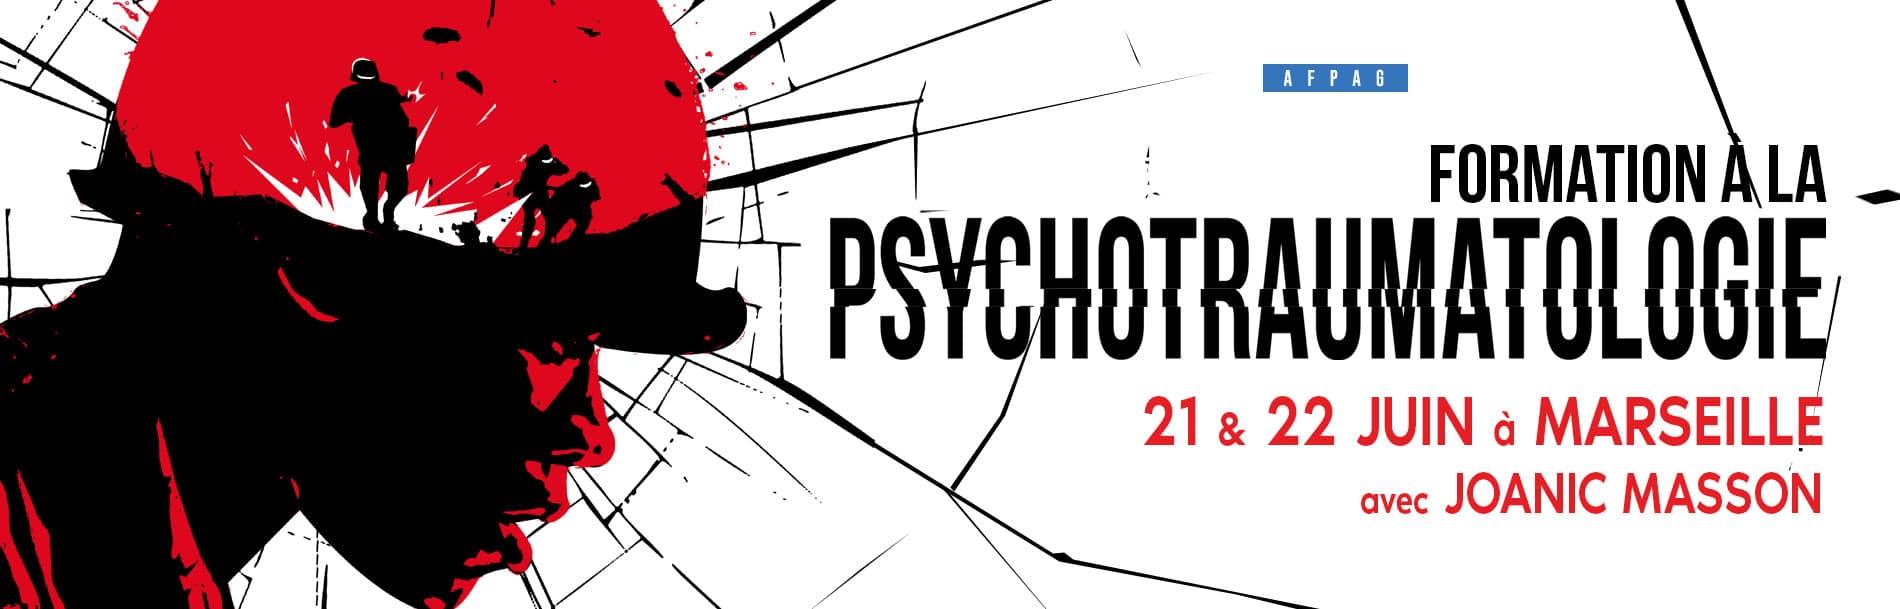 psychotraumatologie - Marseille